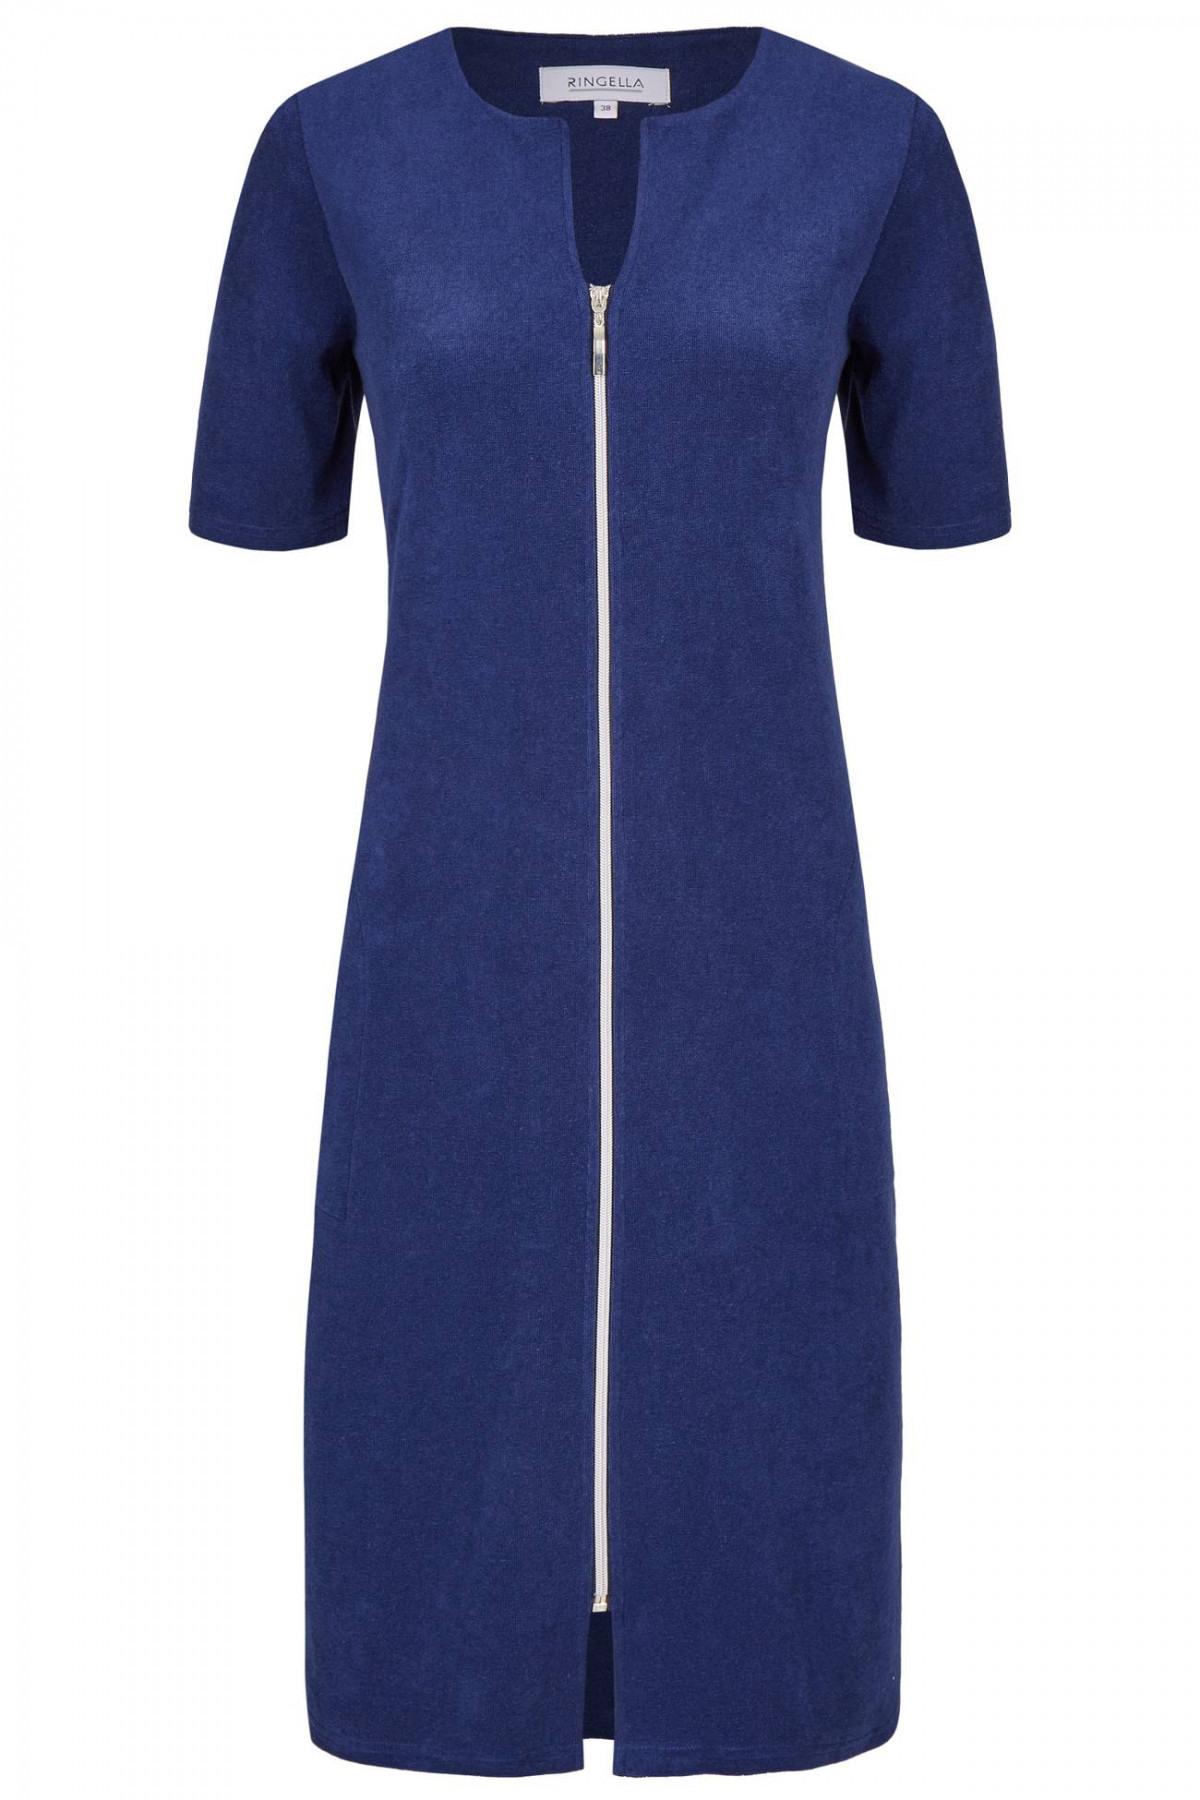 Ringella Damen Frottee Kleid Strandkleid Hauskleid